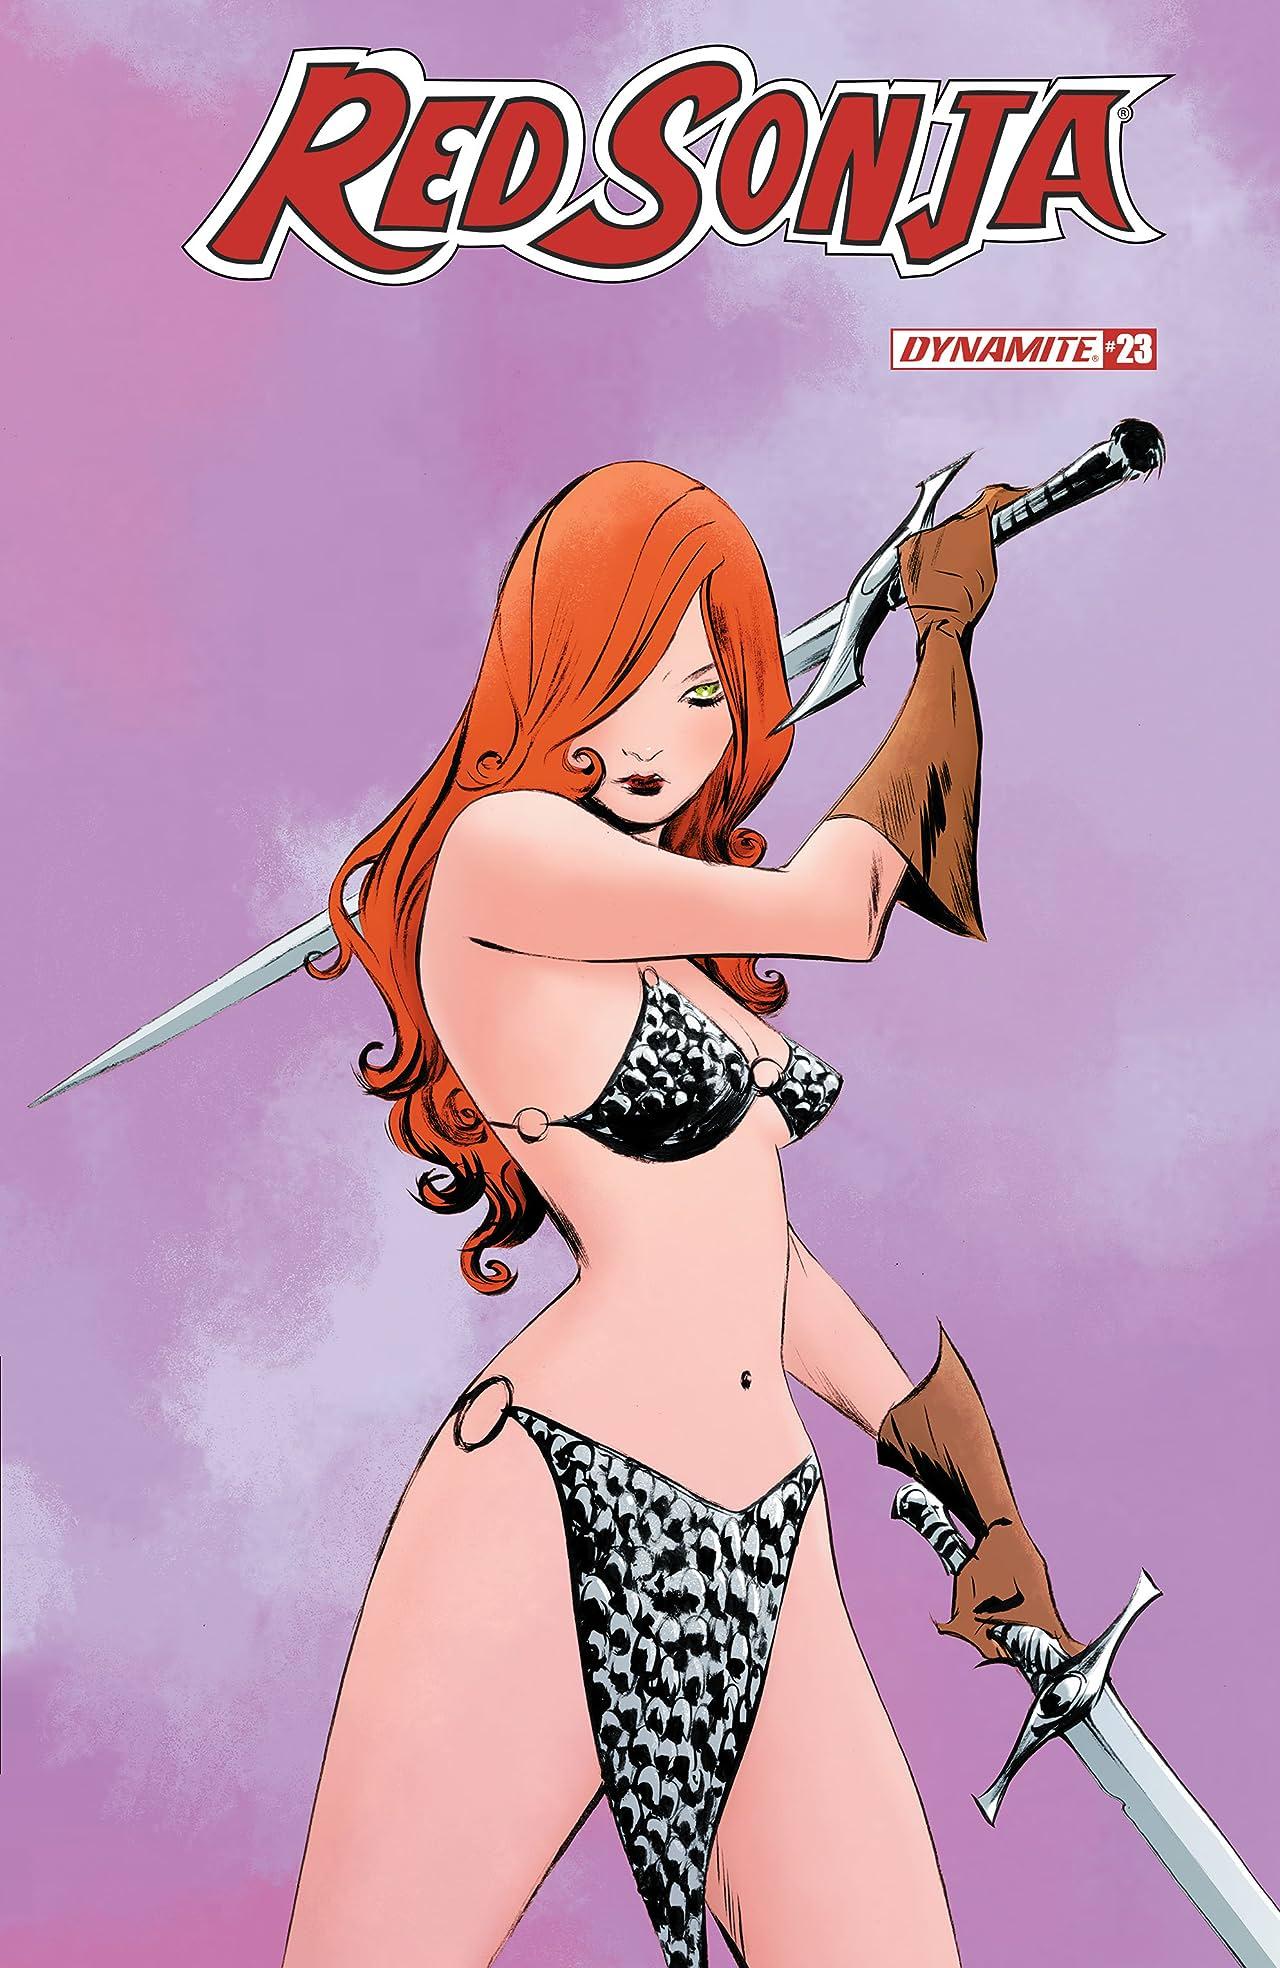 Red Sonja (2019-) #23